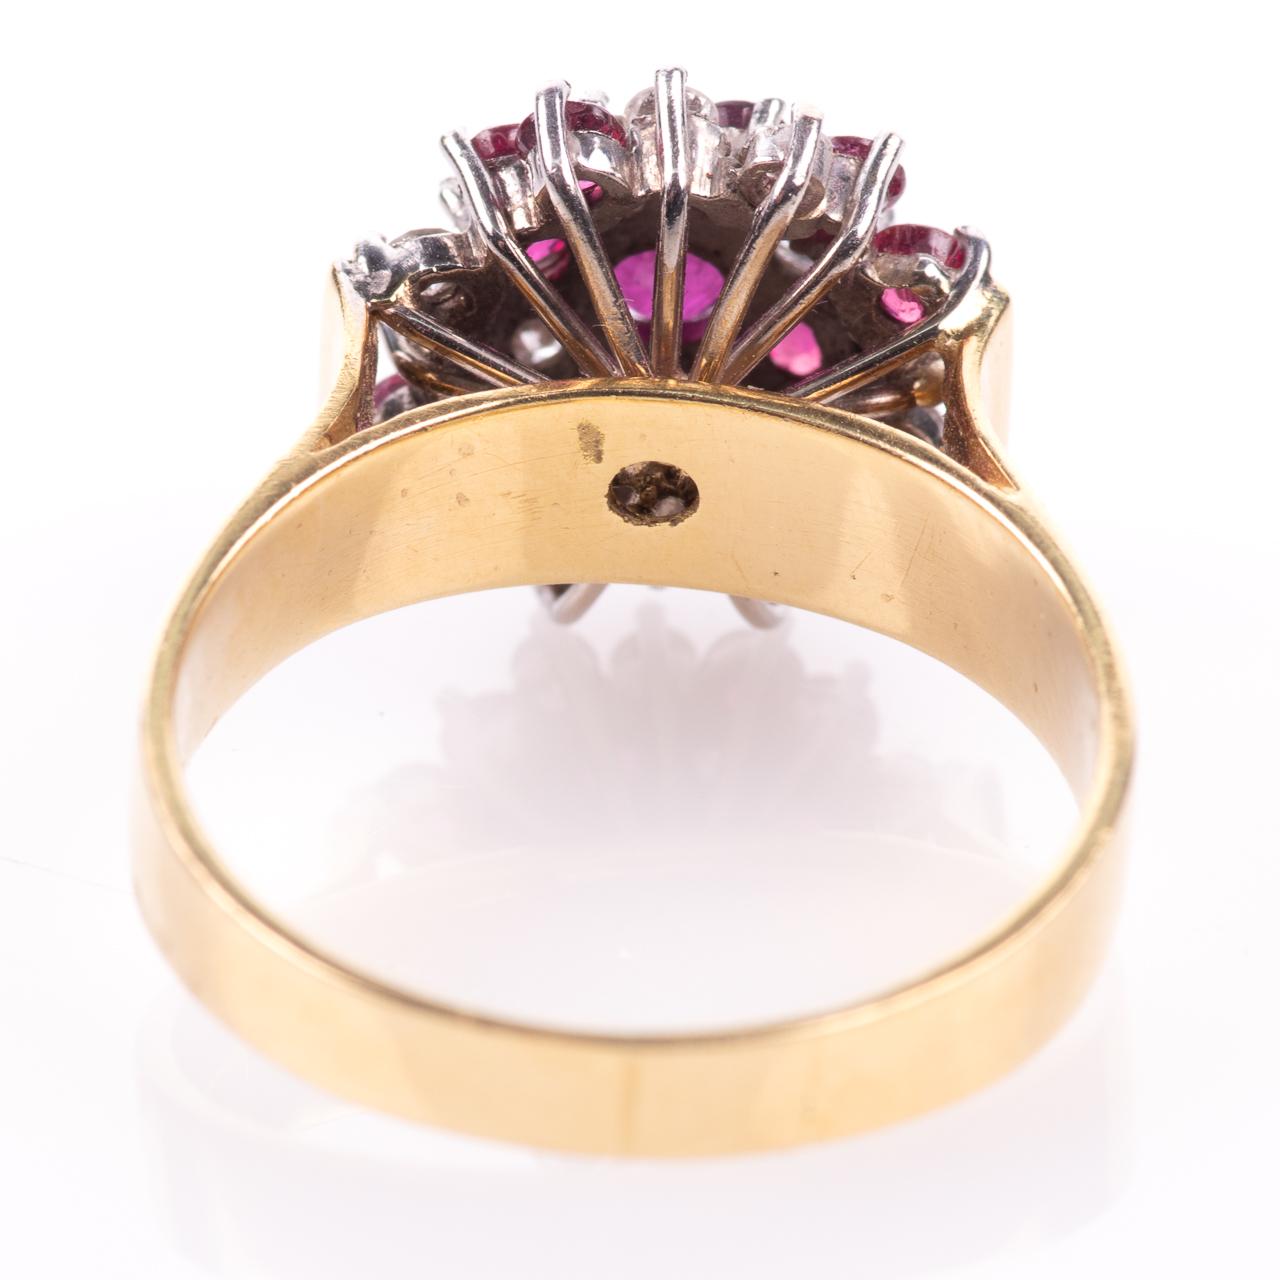 18ct Gold Ruby & 0.35ct Diamond Cluster Ring Hallmarked Birmingham - Image 6 of 7